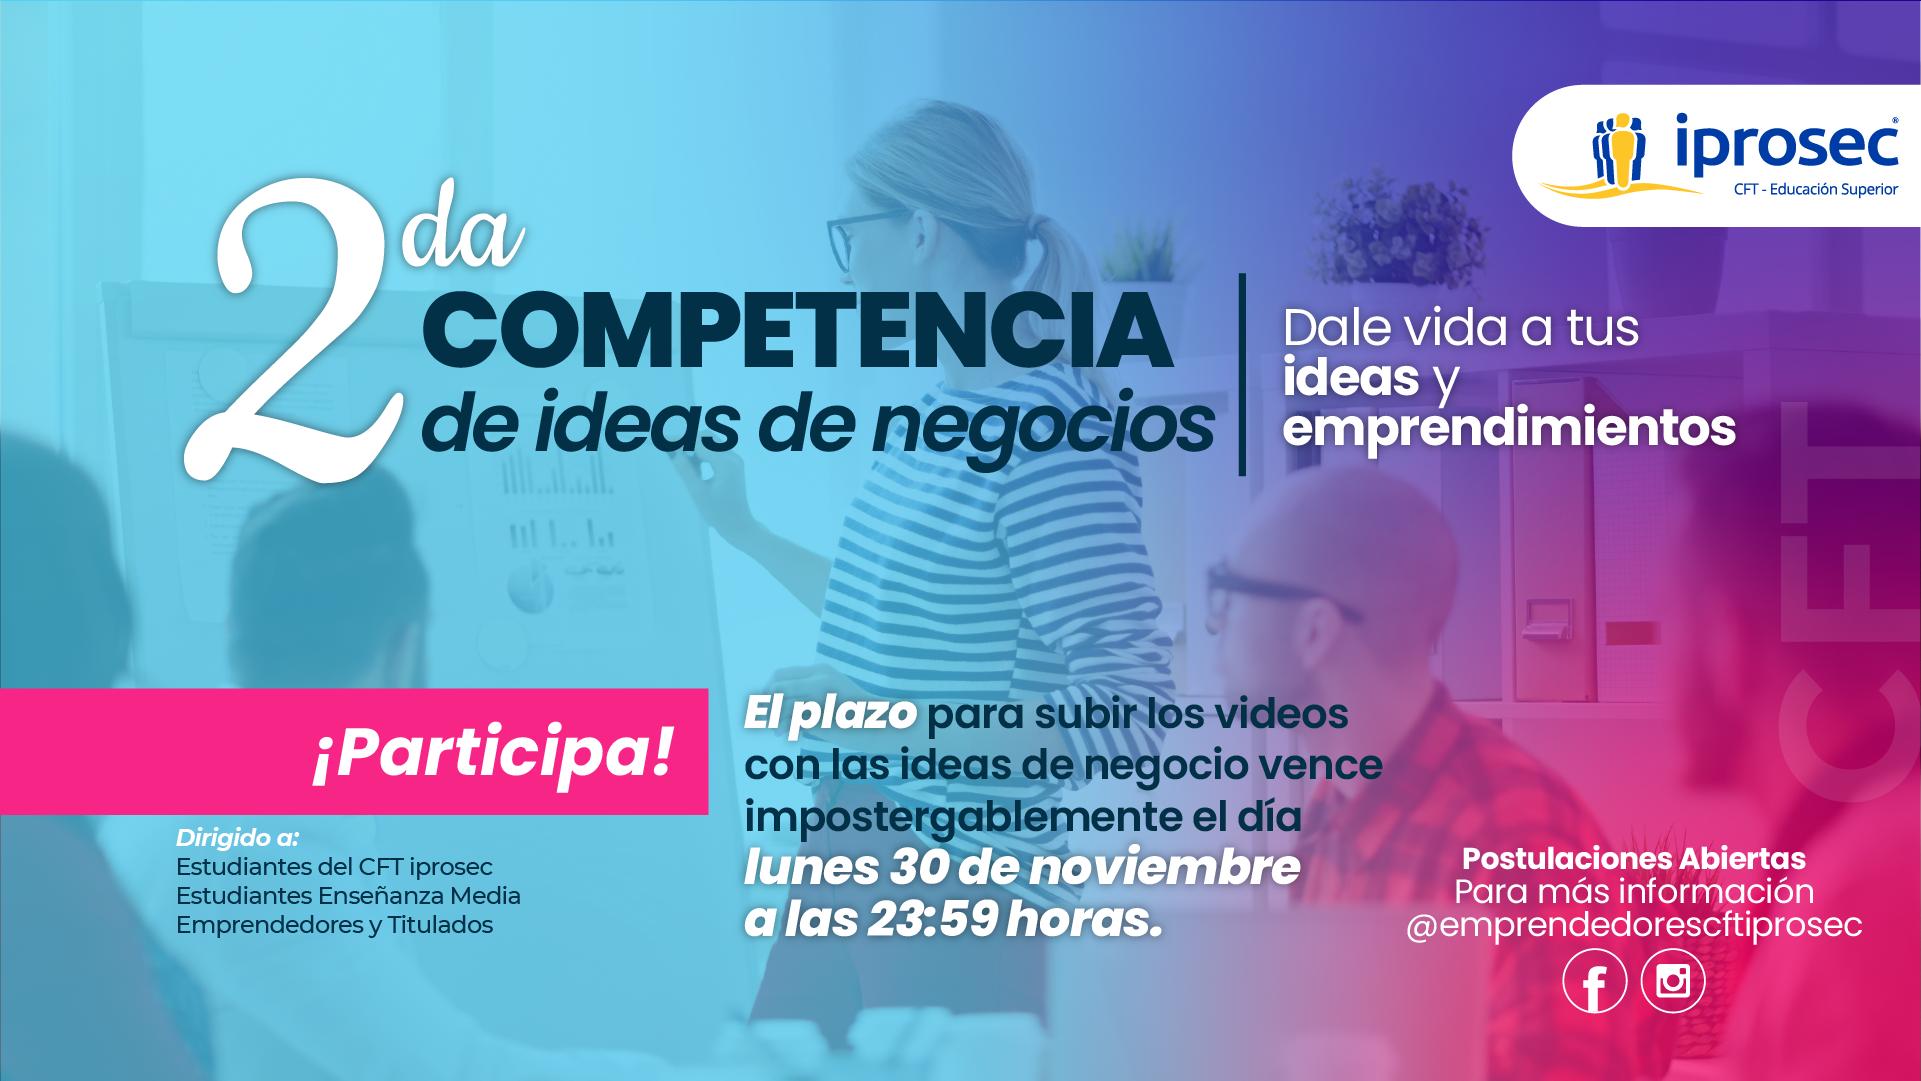 ¡Te invitamos a participar! 2da Competencia de Ideas de Negocio